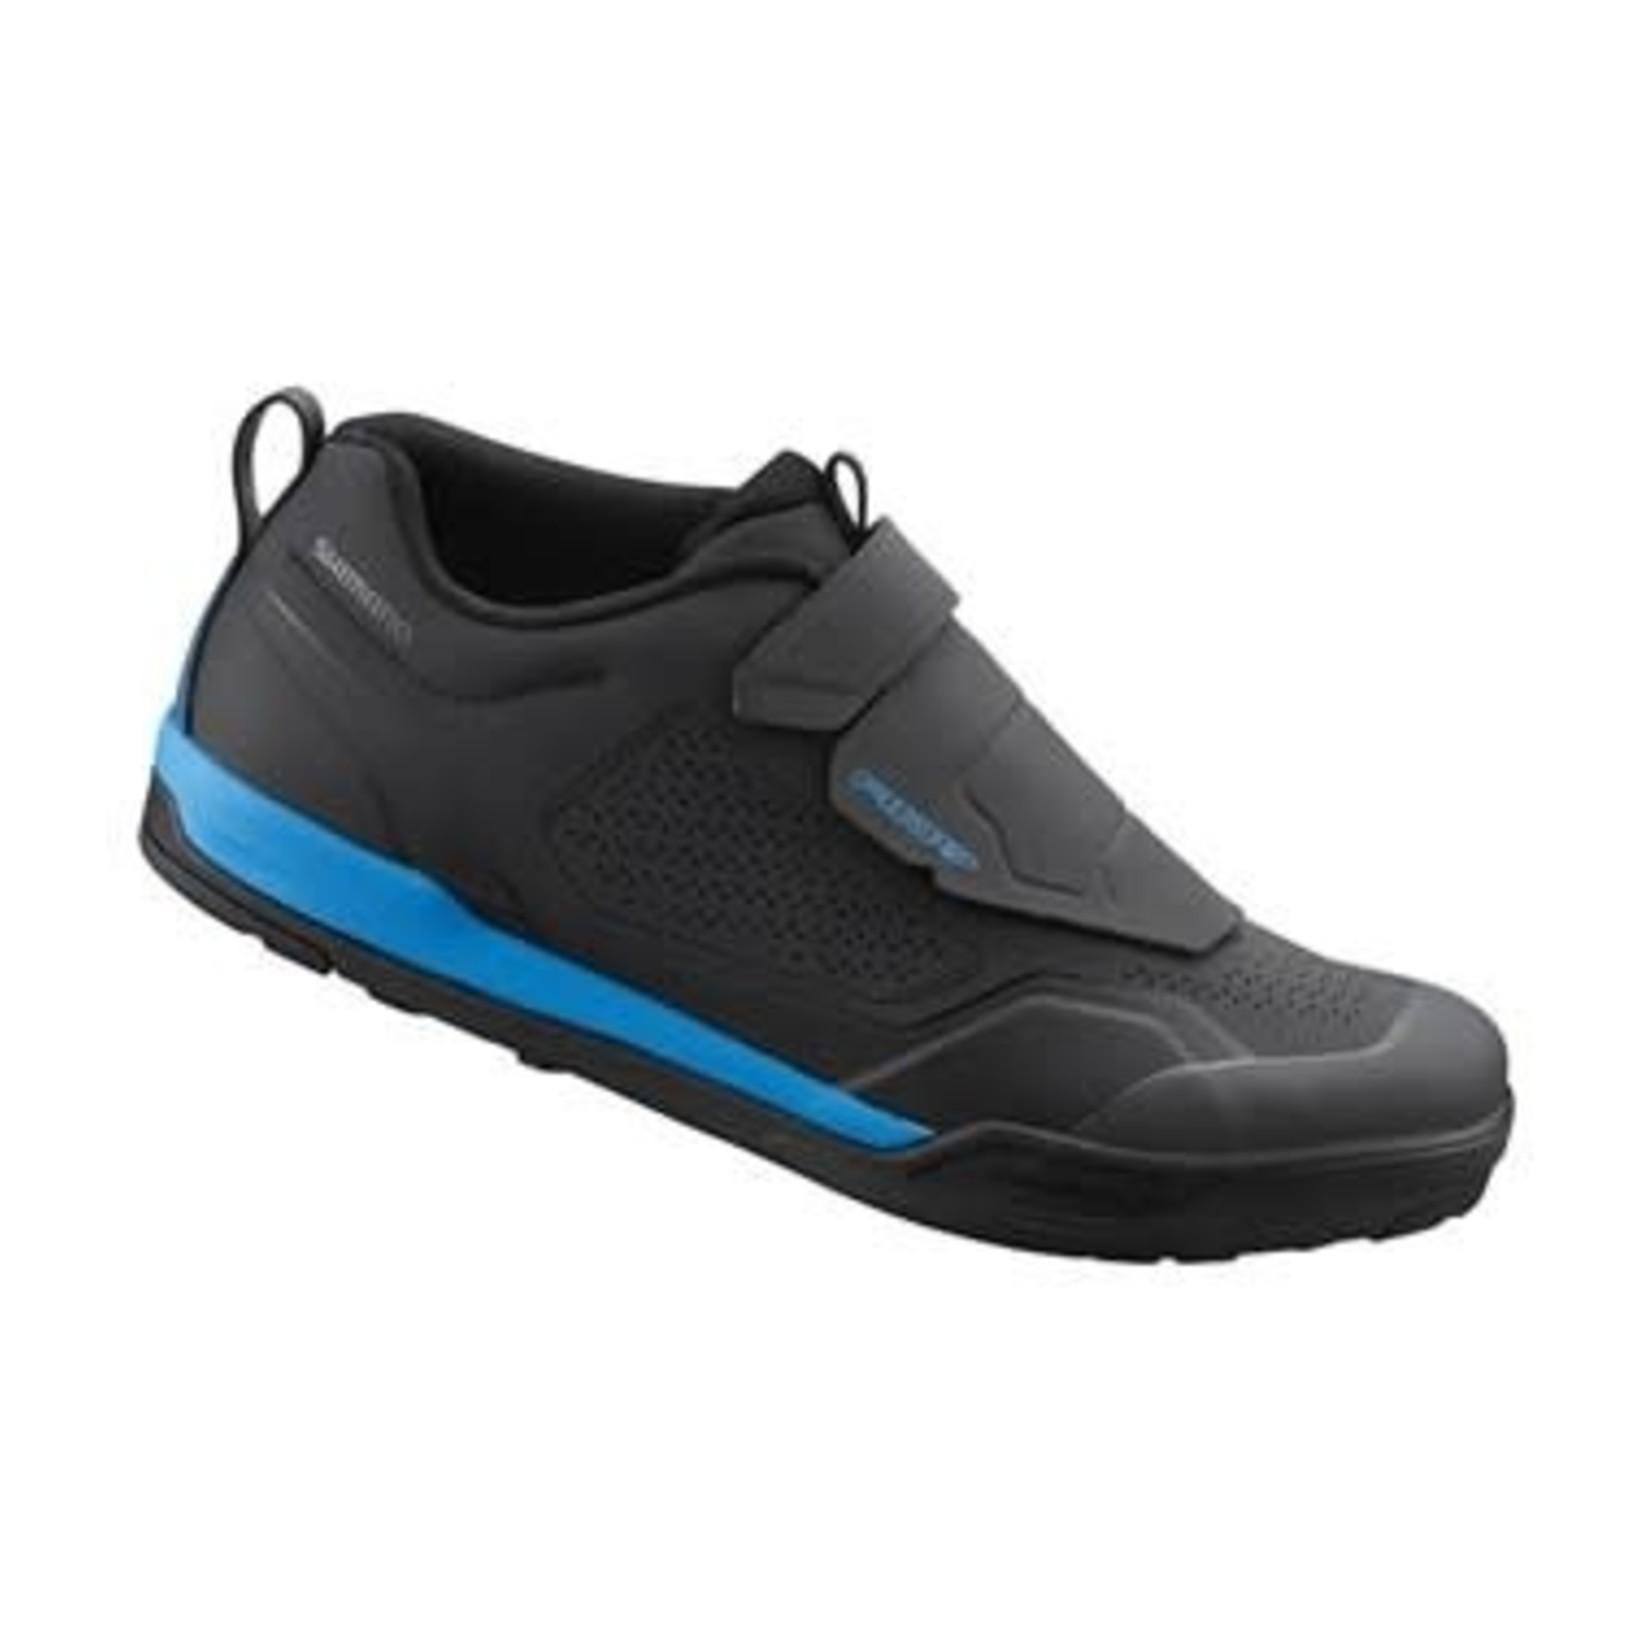 Shimano SH-AM902 Bicycle Shoes